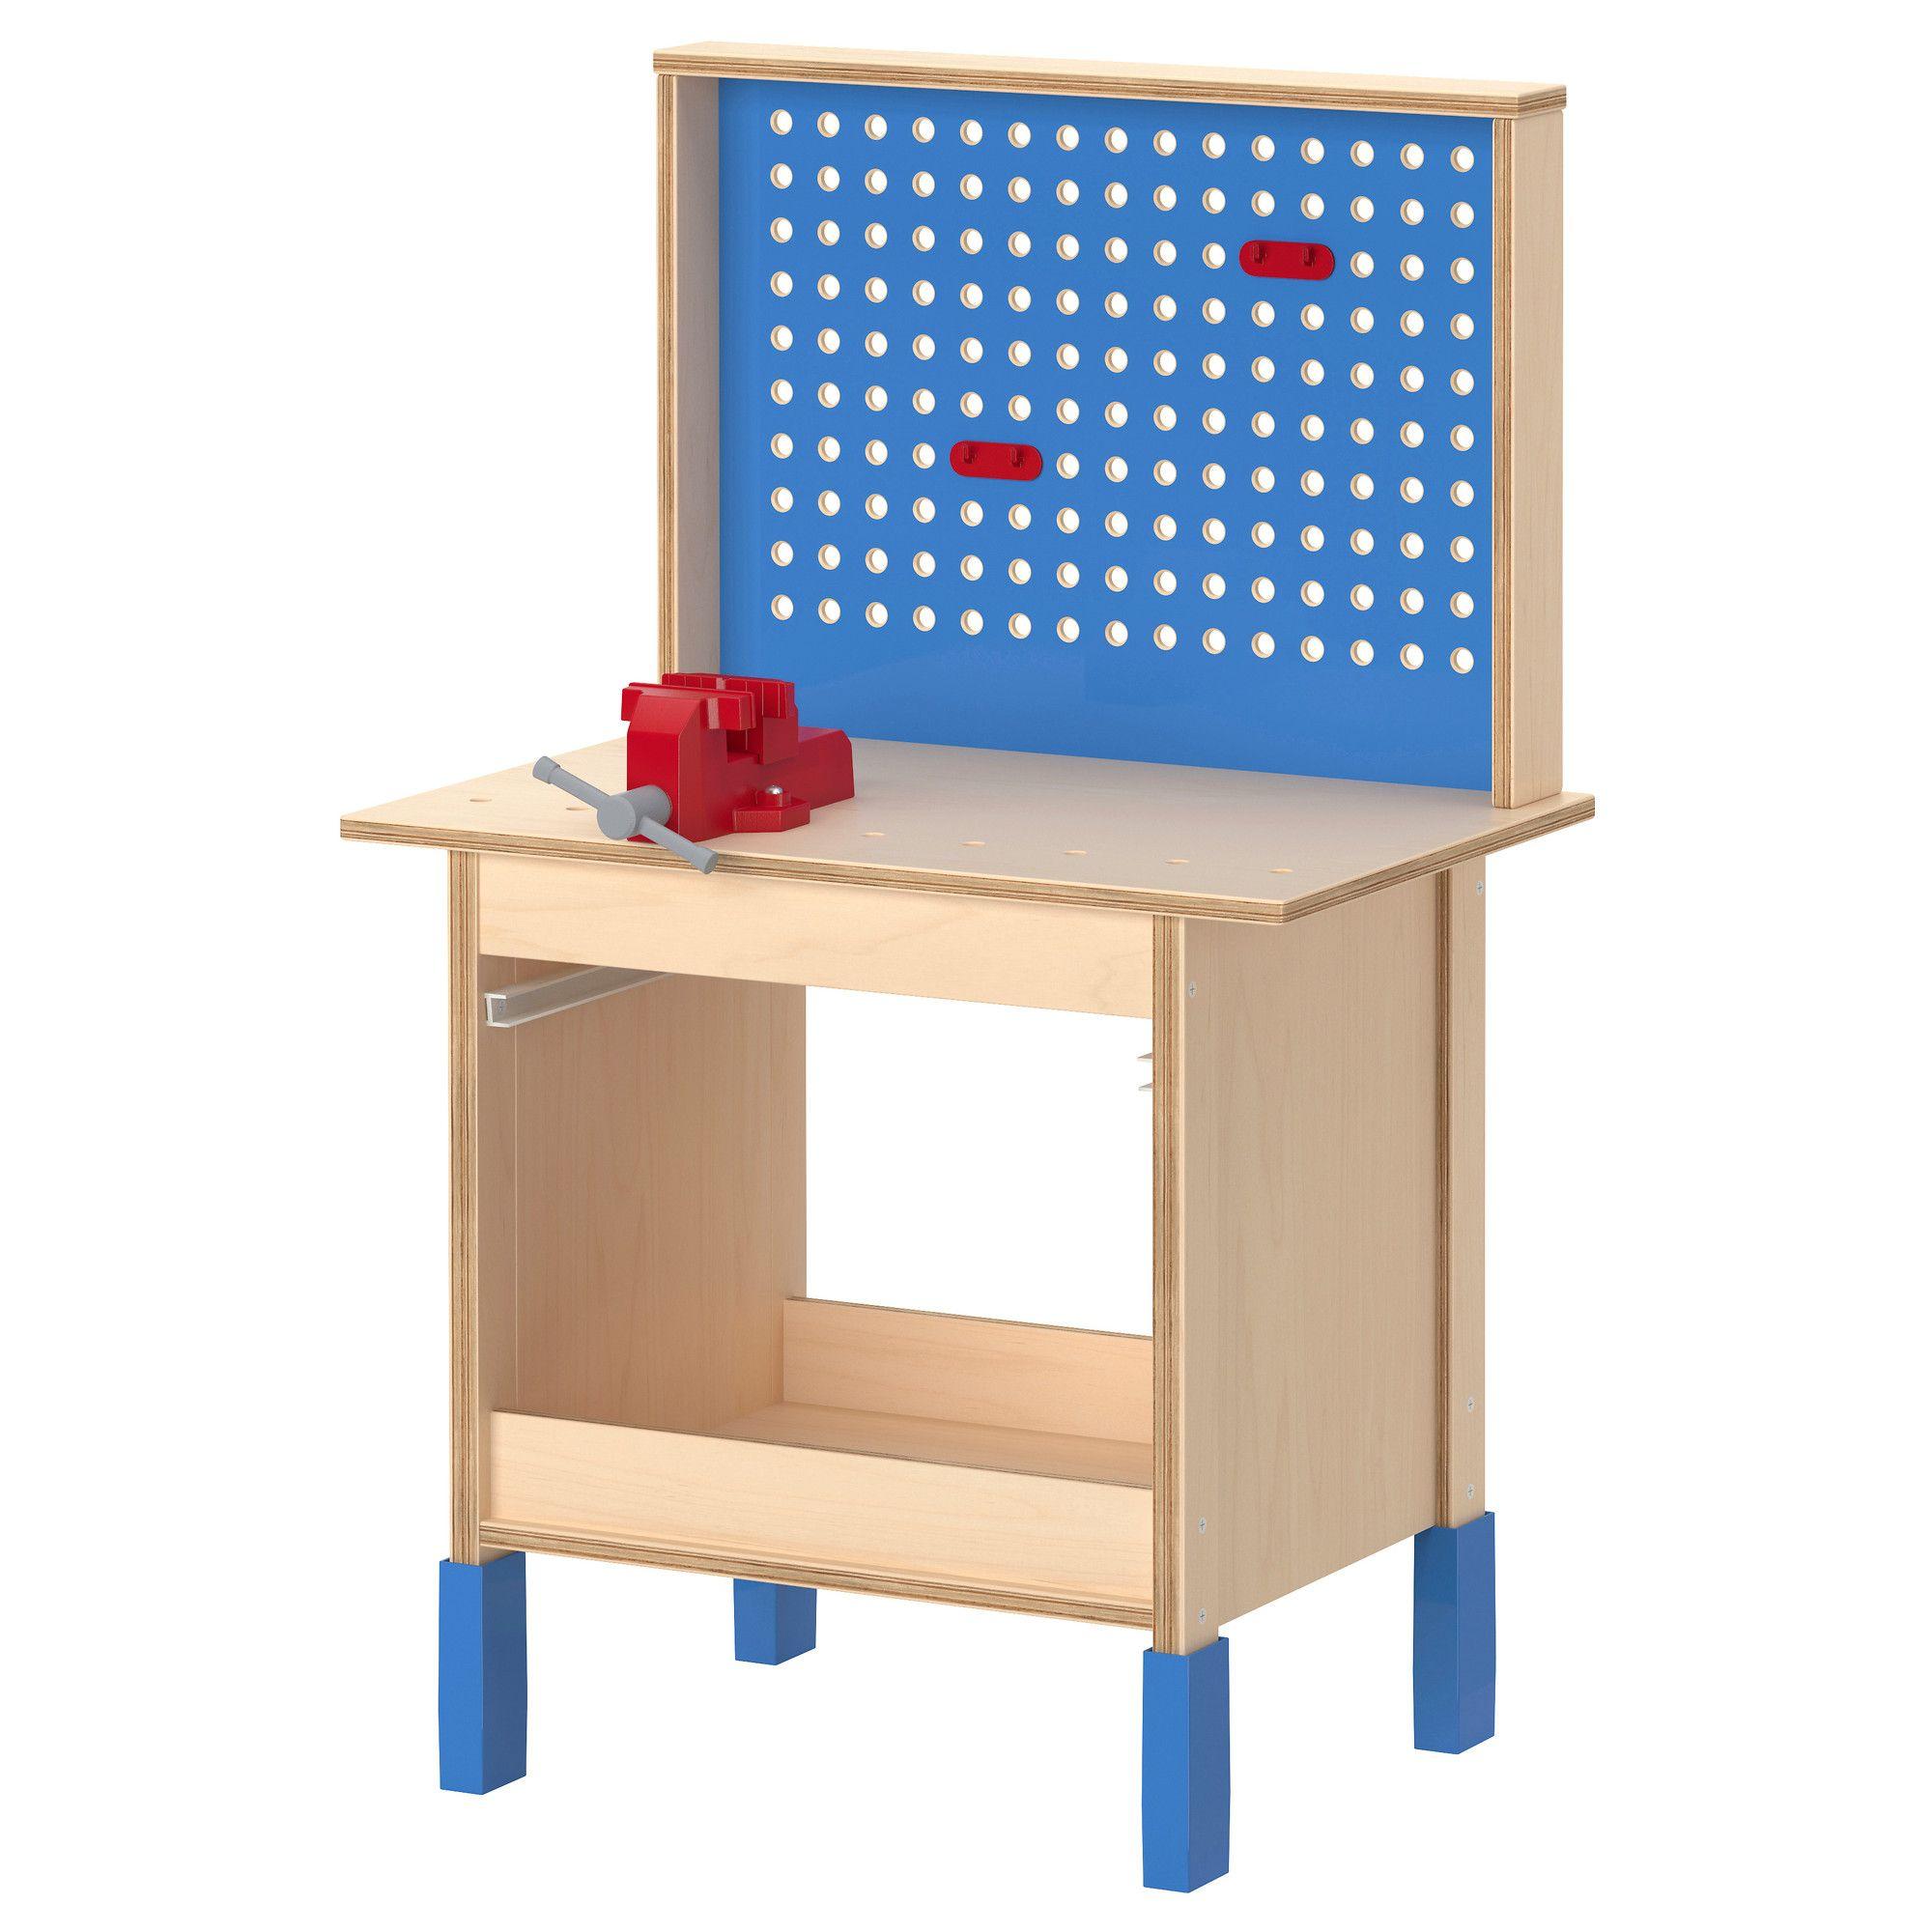 duktig werkbank - ikea | kinderkamer | ikea, playroom et bench